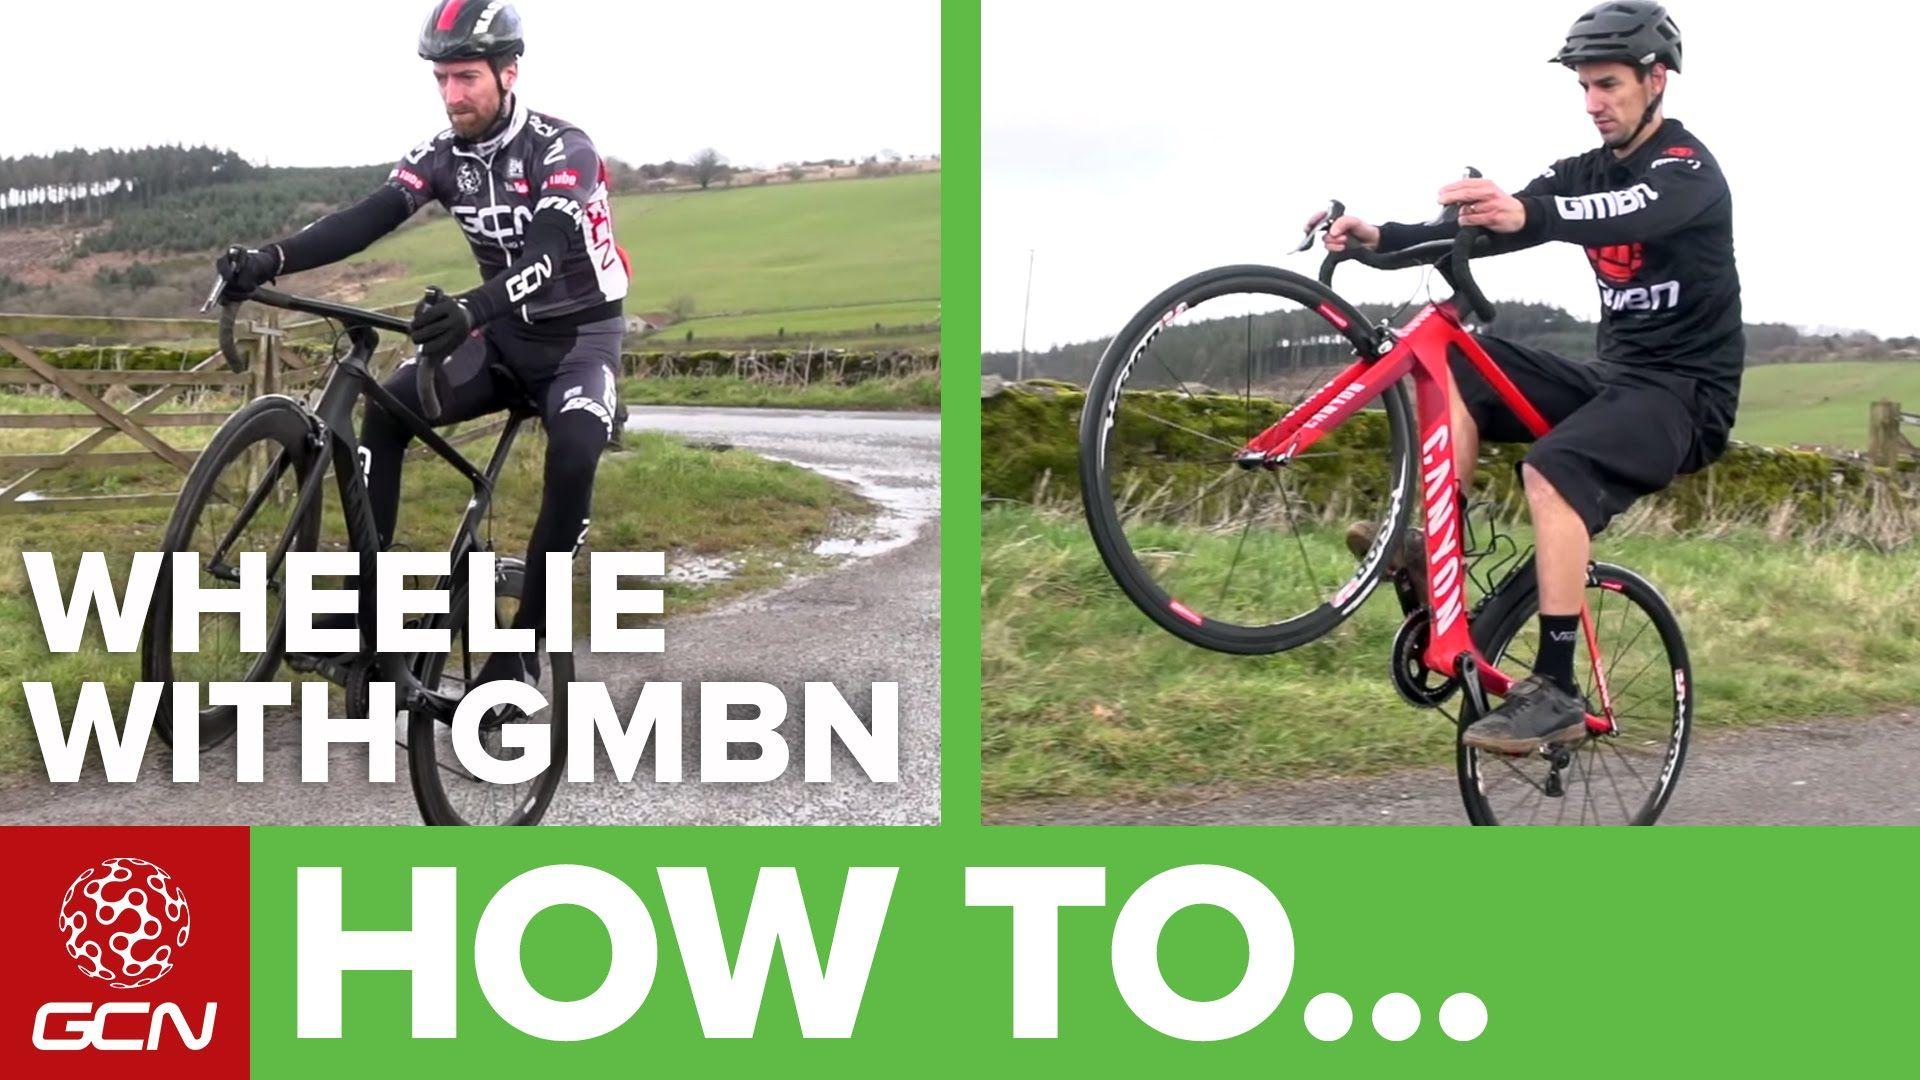 How To Wheelie A Road Bike Can Gmbn Wheelie On A Road Bike